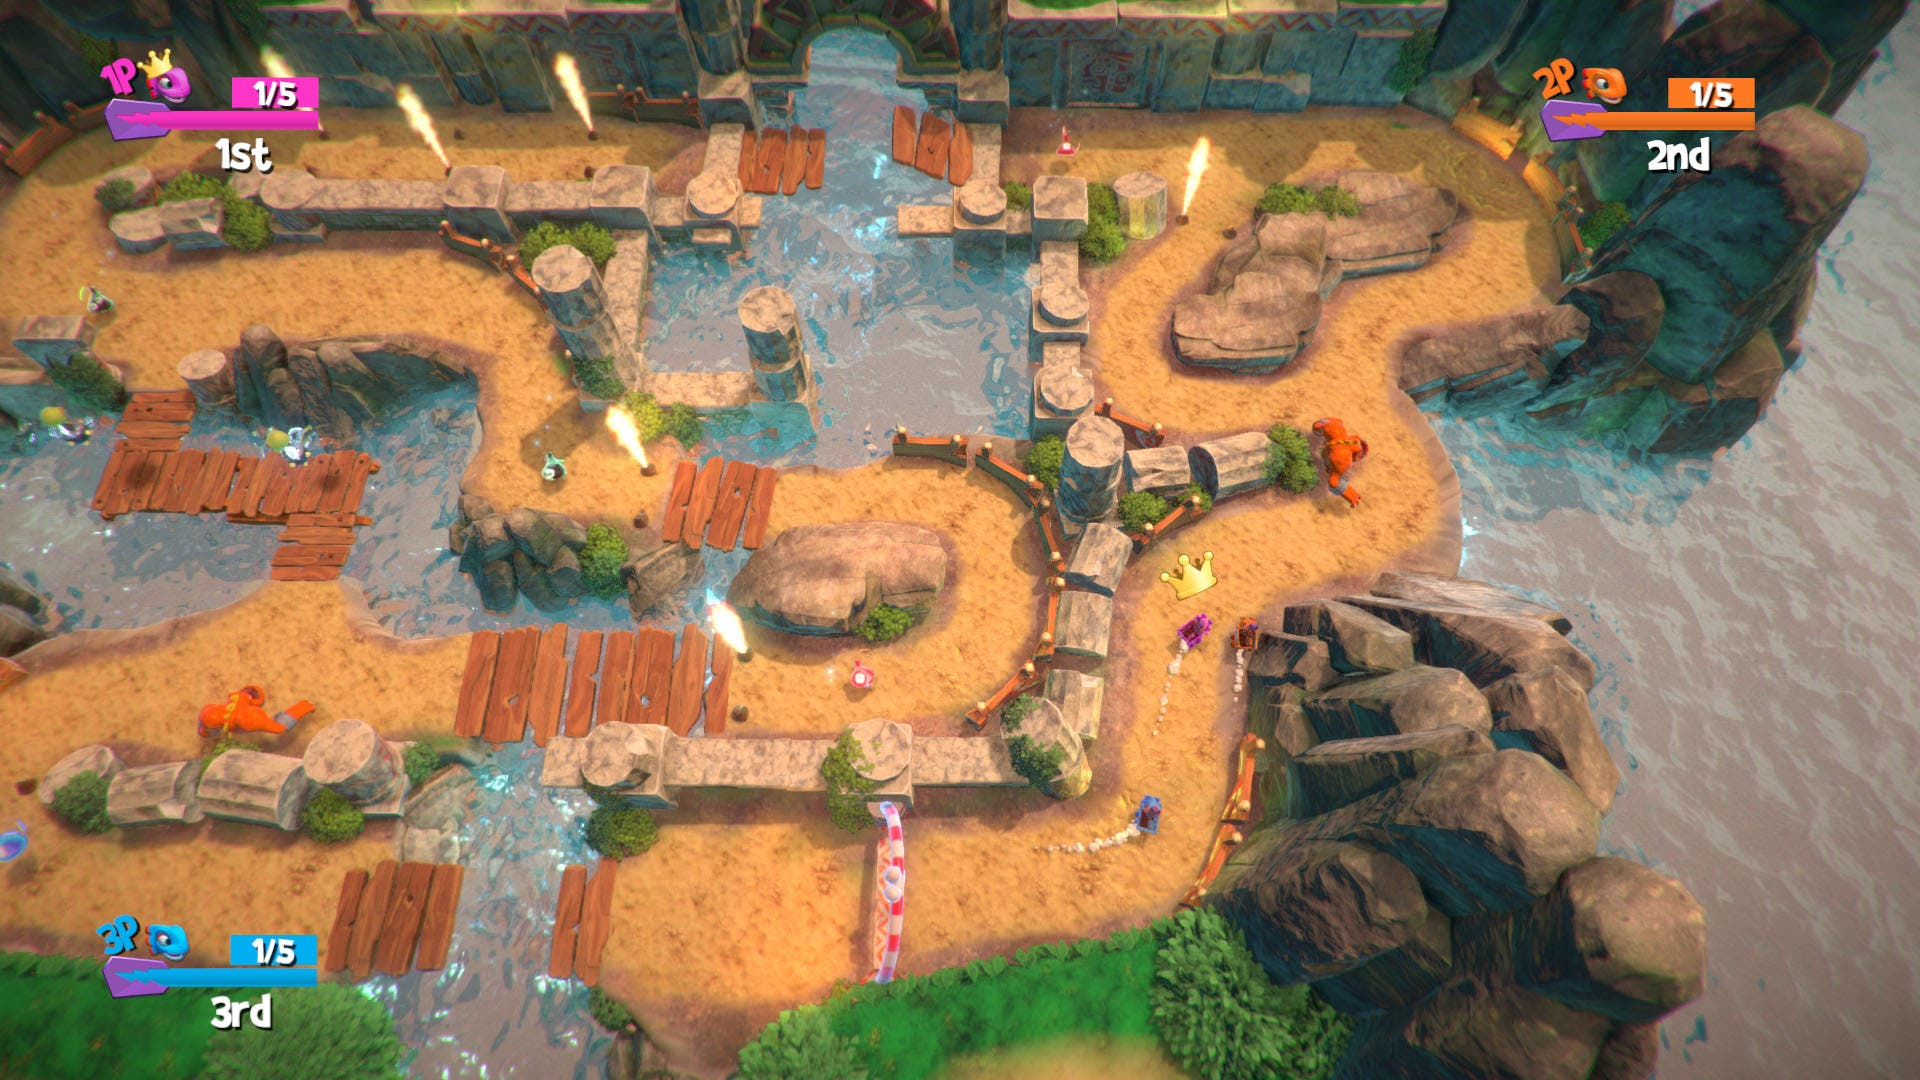 Análisis de Yooka-Laylee - Xbox One 4